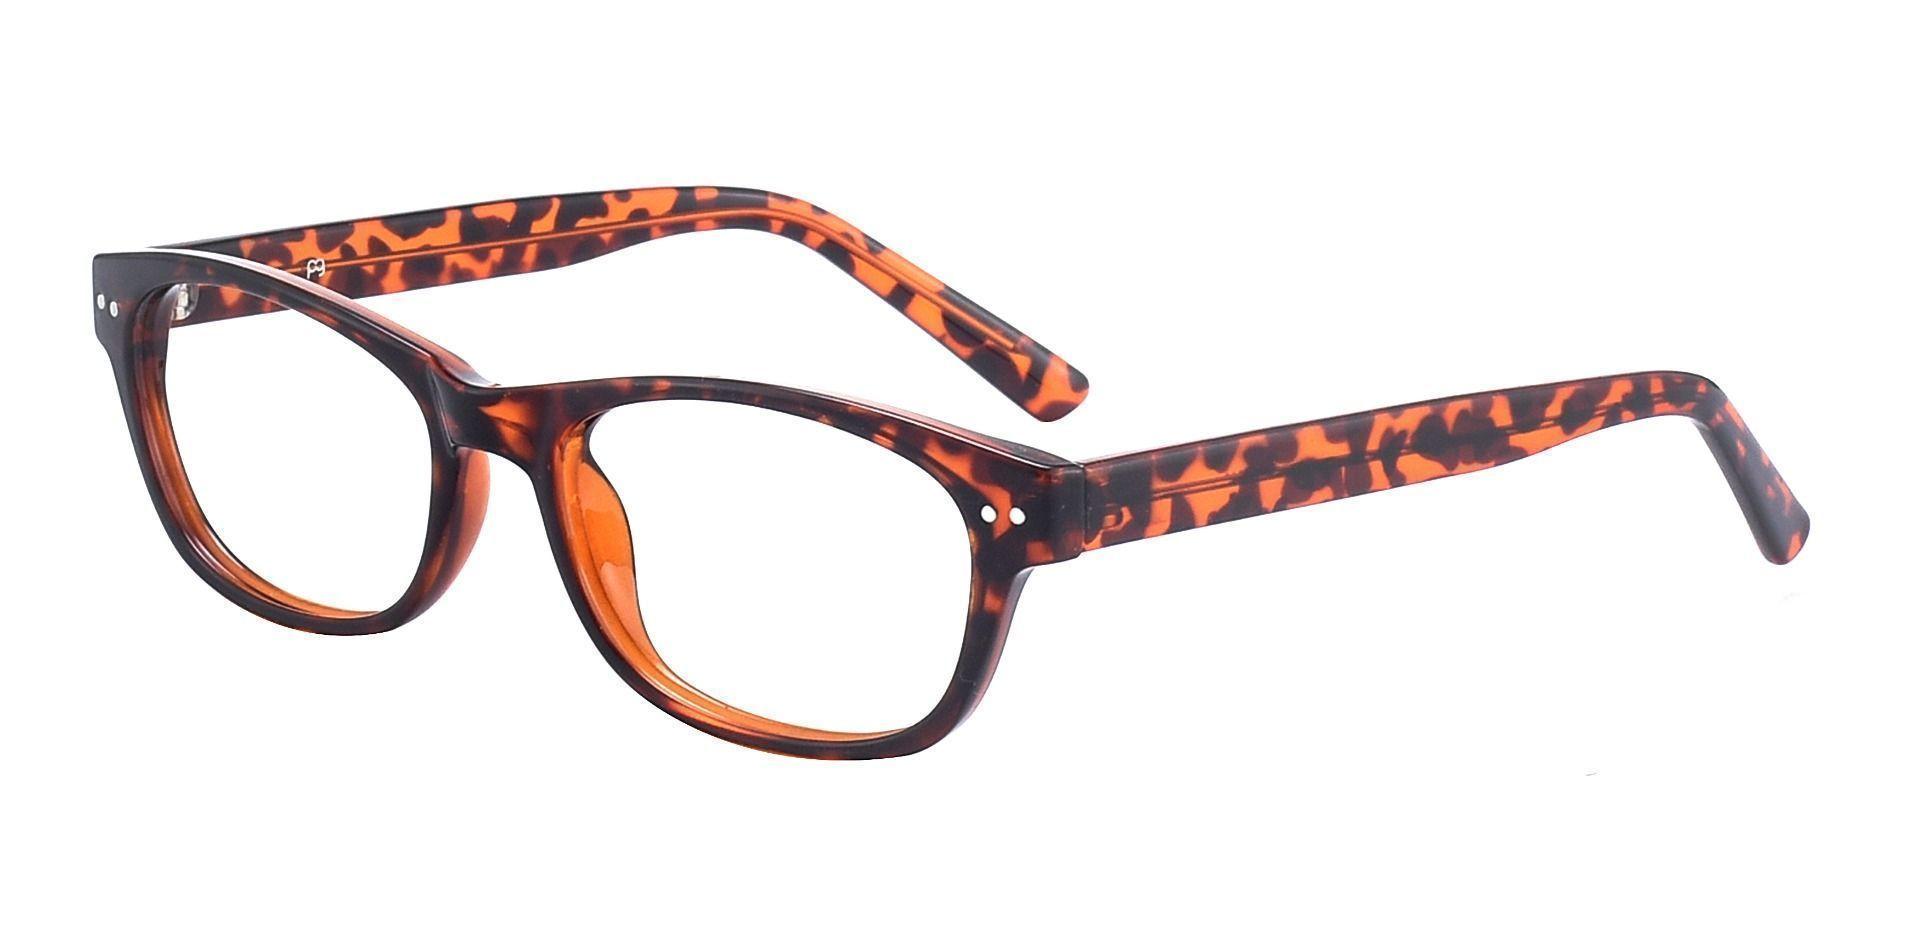 Gulf Rectangle Blue Light Blocking Glasses - Tortoiseshell